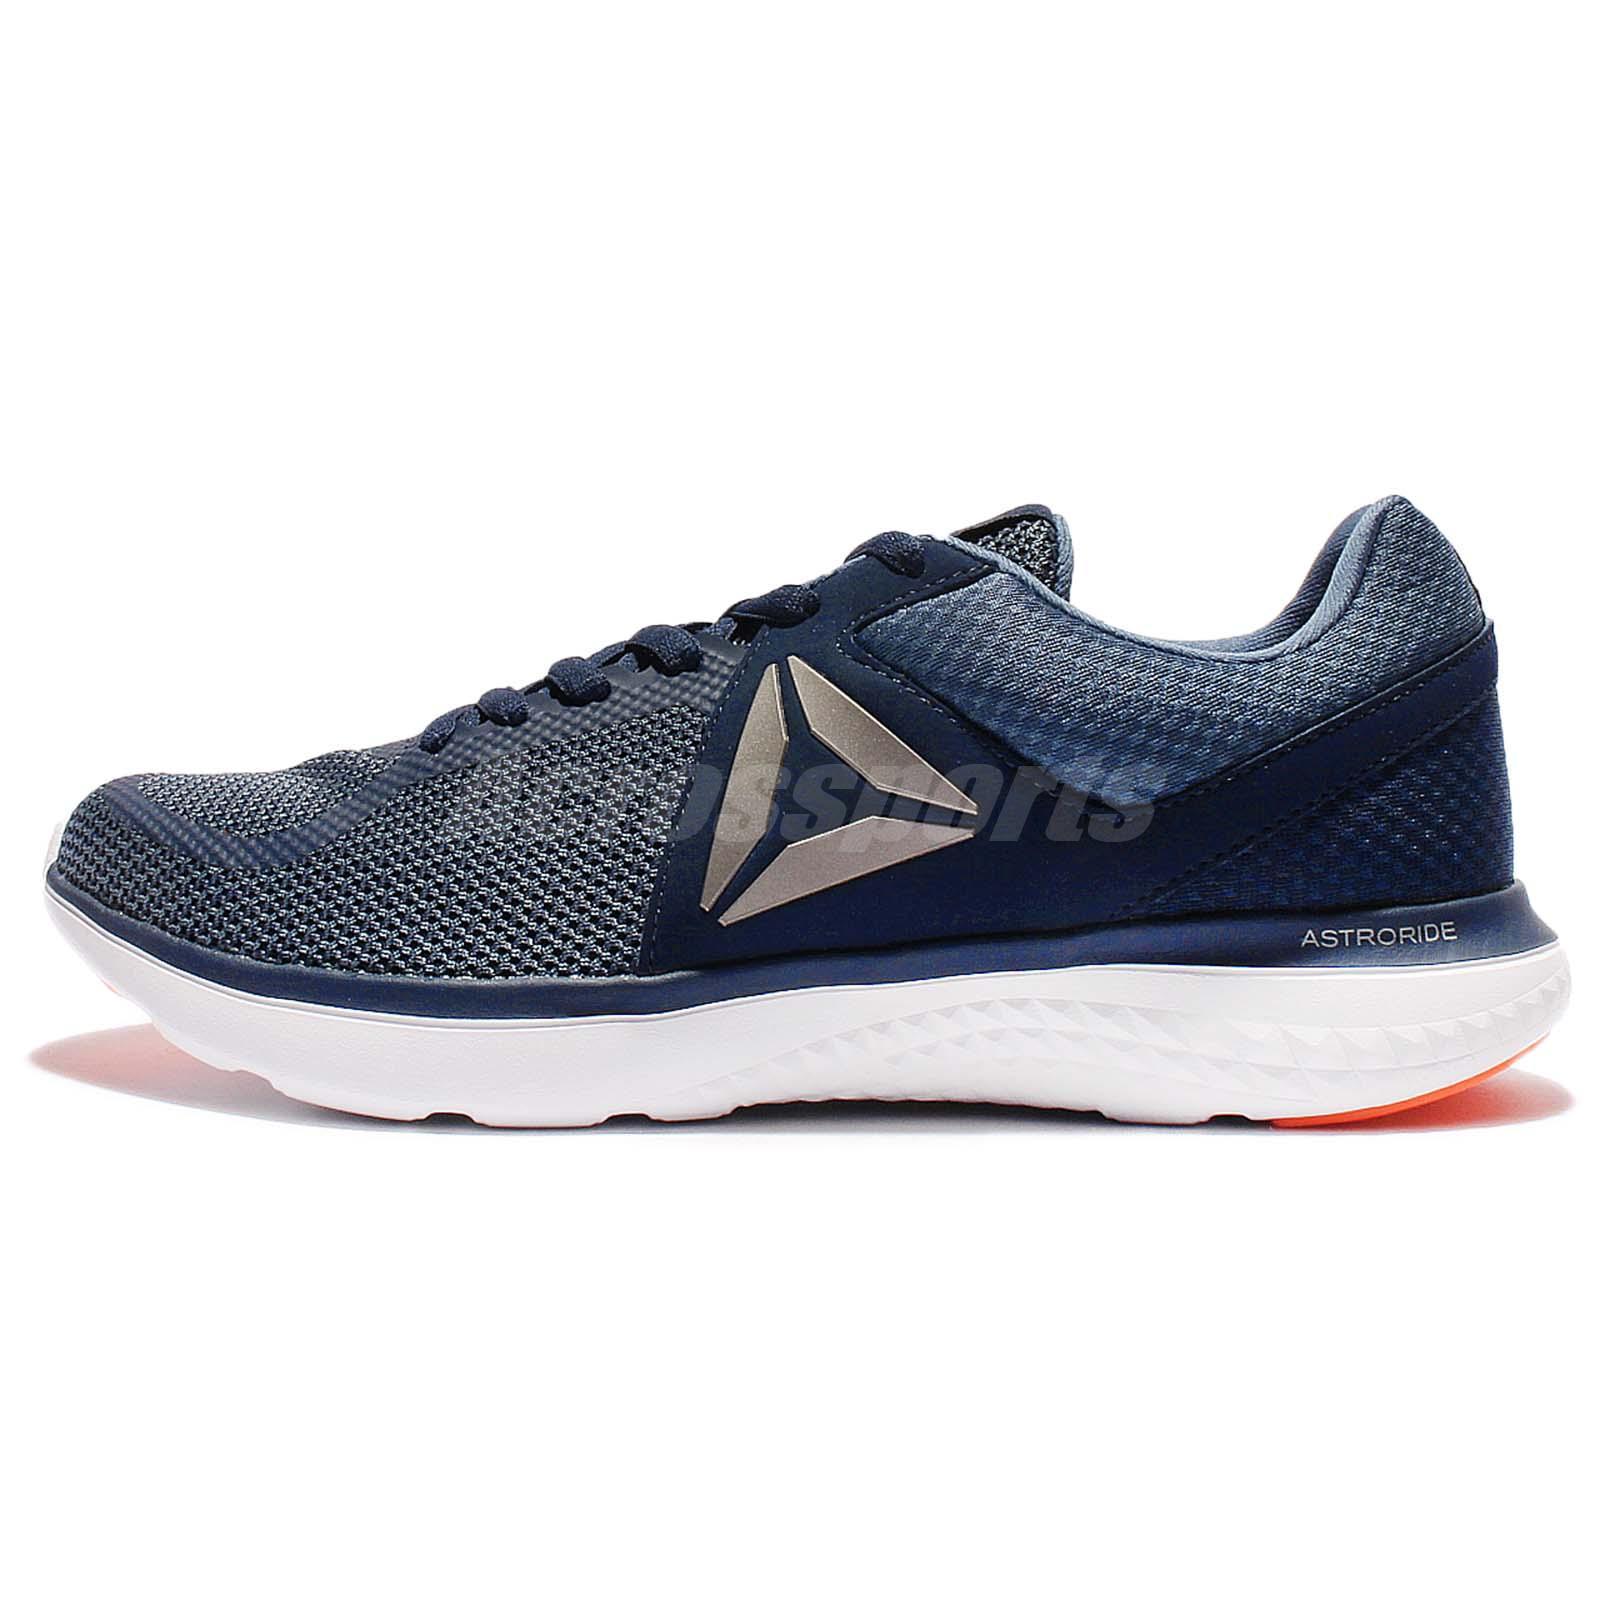 Reebok Astroride Run Navy Blue Orange White Men Running Shoes Sneakers  BD2203 f9cd9fb90